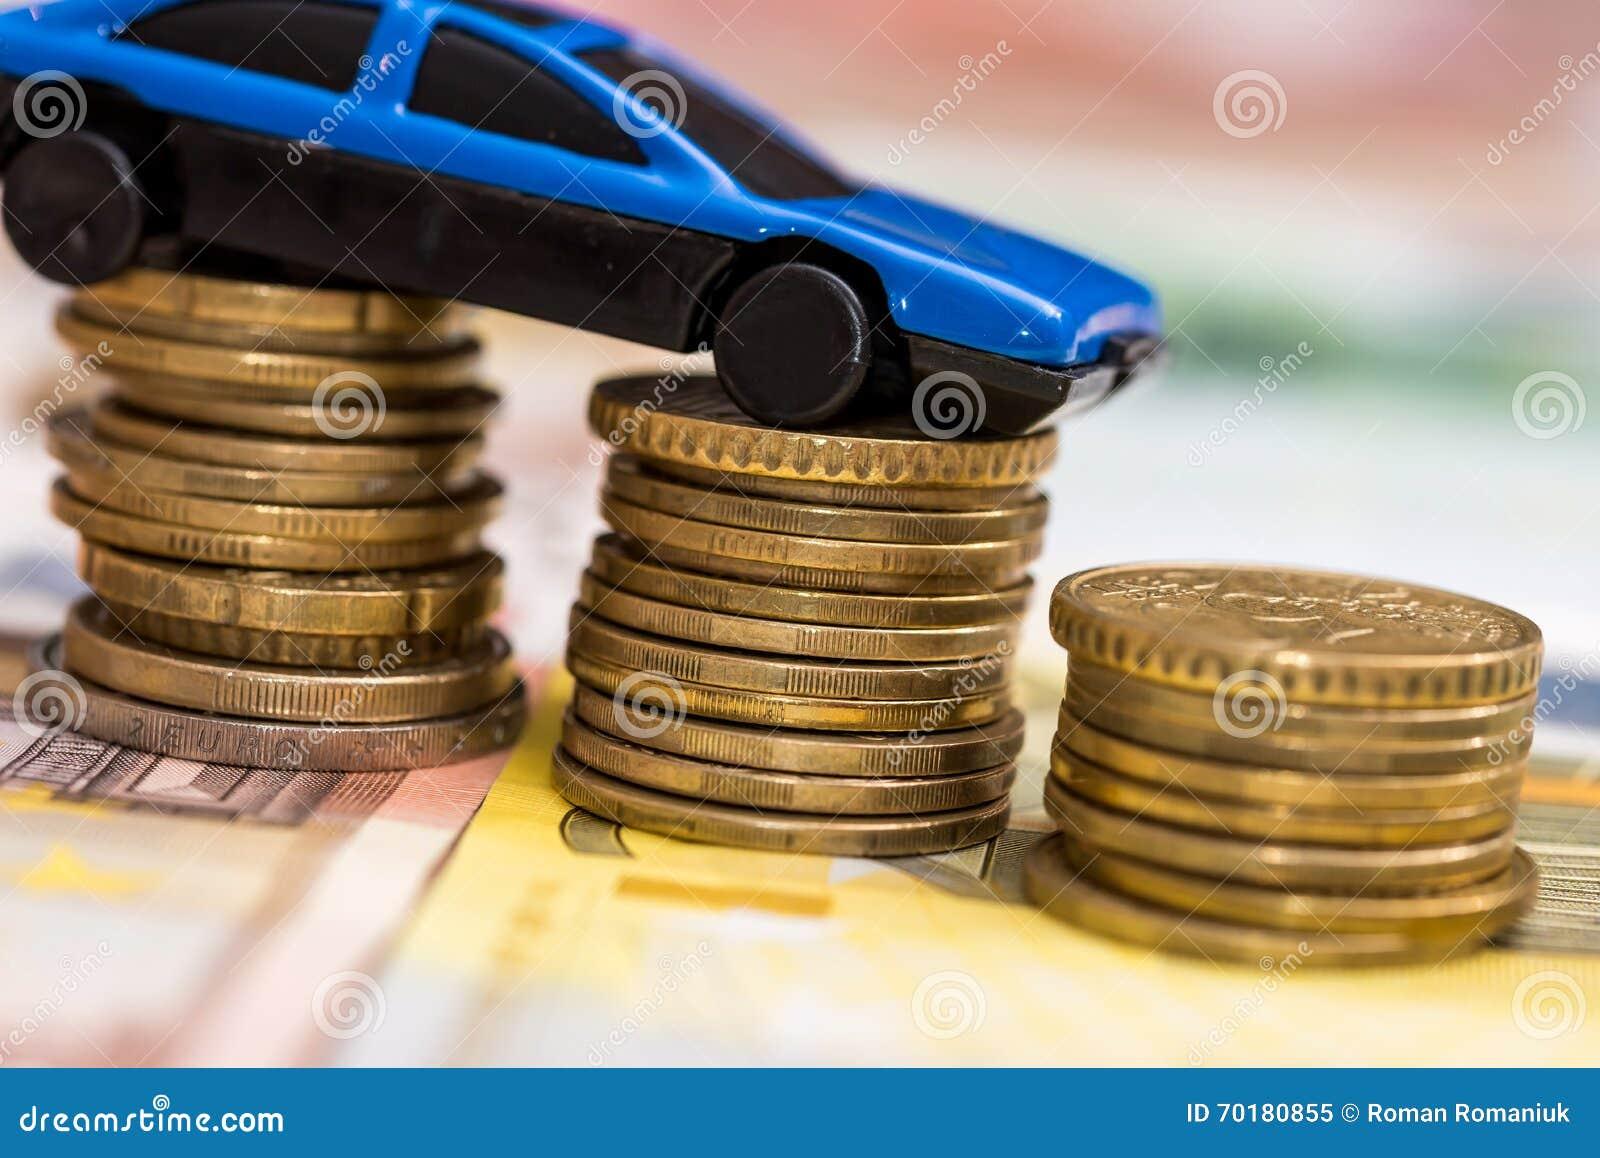 Blå leksakbil på mynt och euro